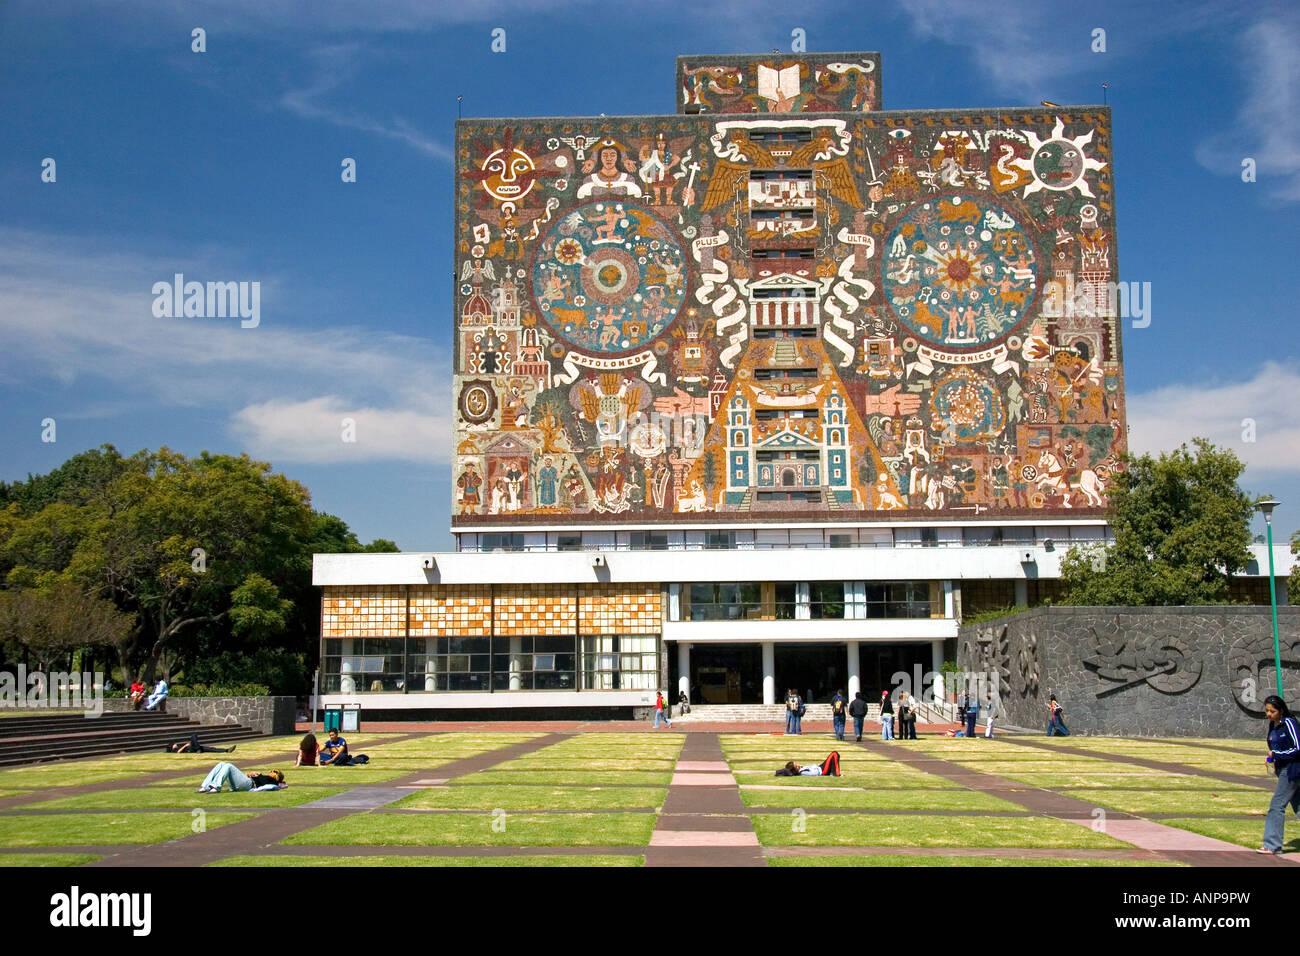 Public Education In Mexico City